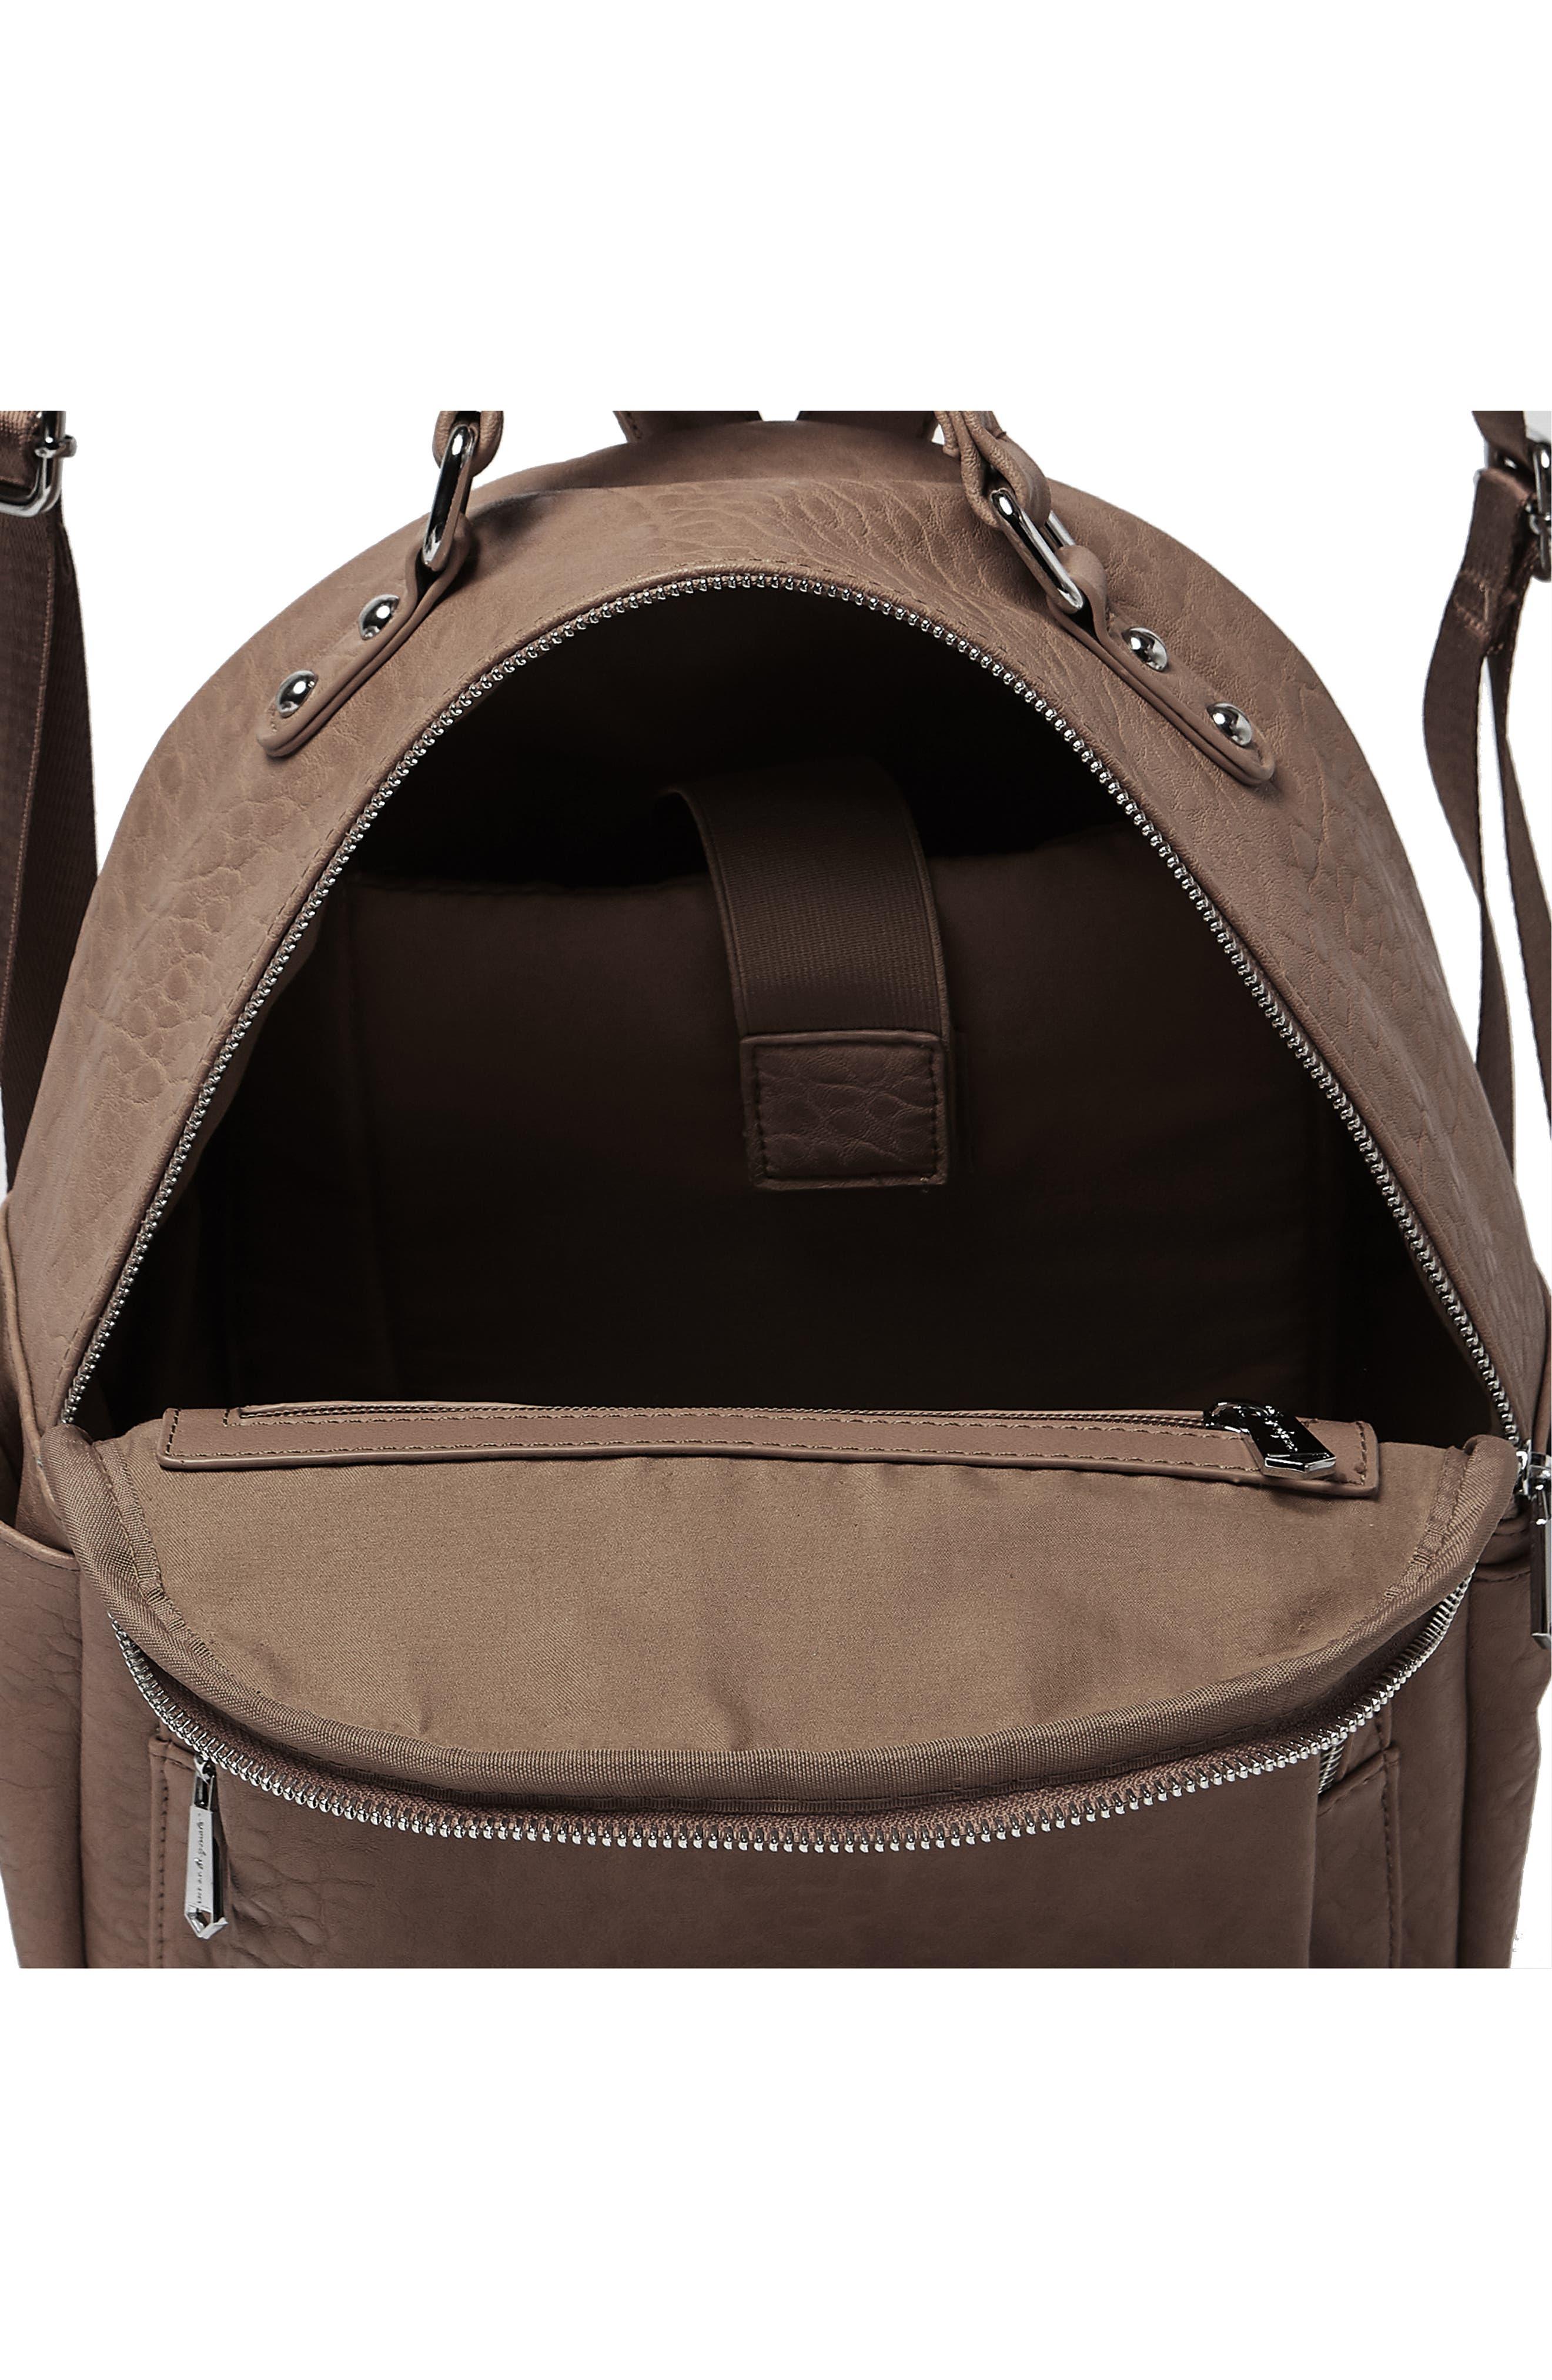 South Bag Vegan Leather Backpack,                             Alternate thumbnail 3, color,                             MOCHA